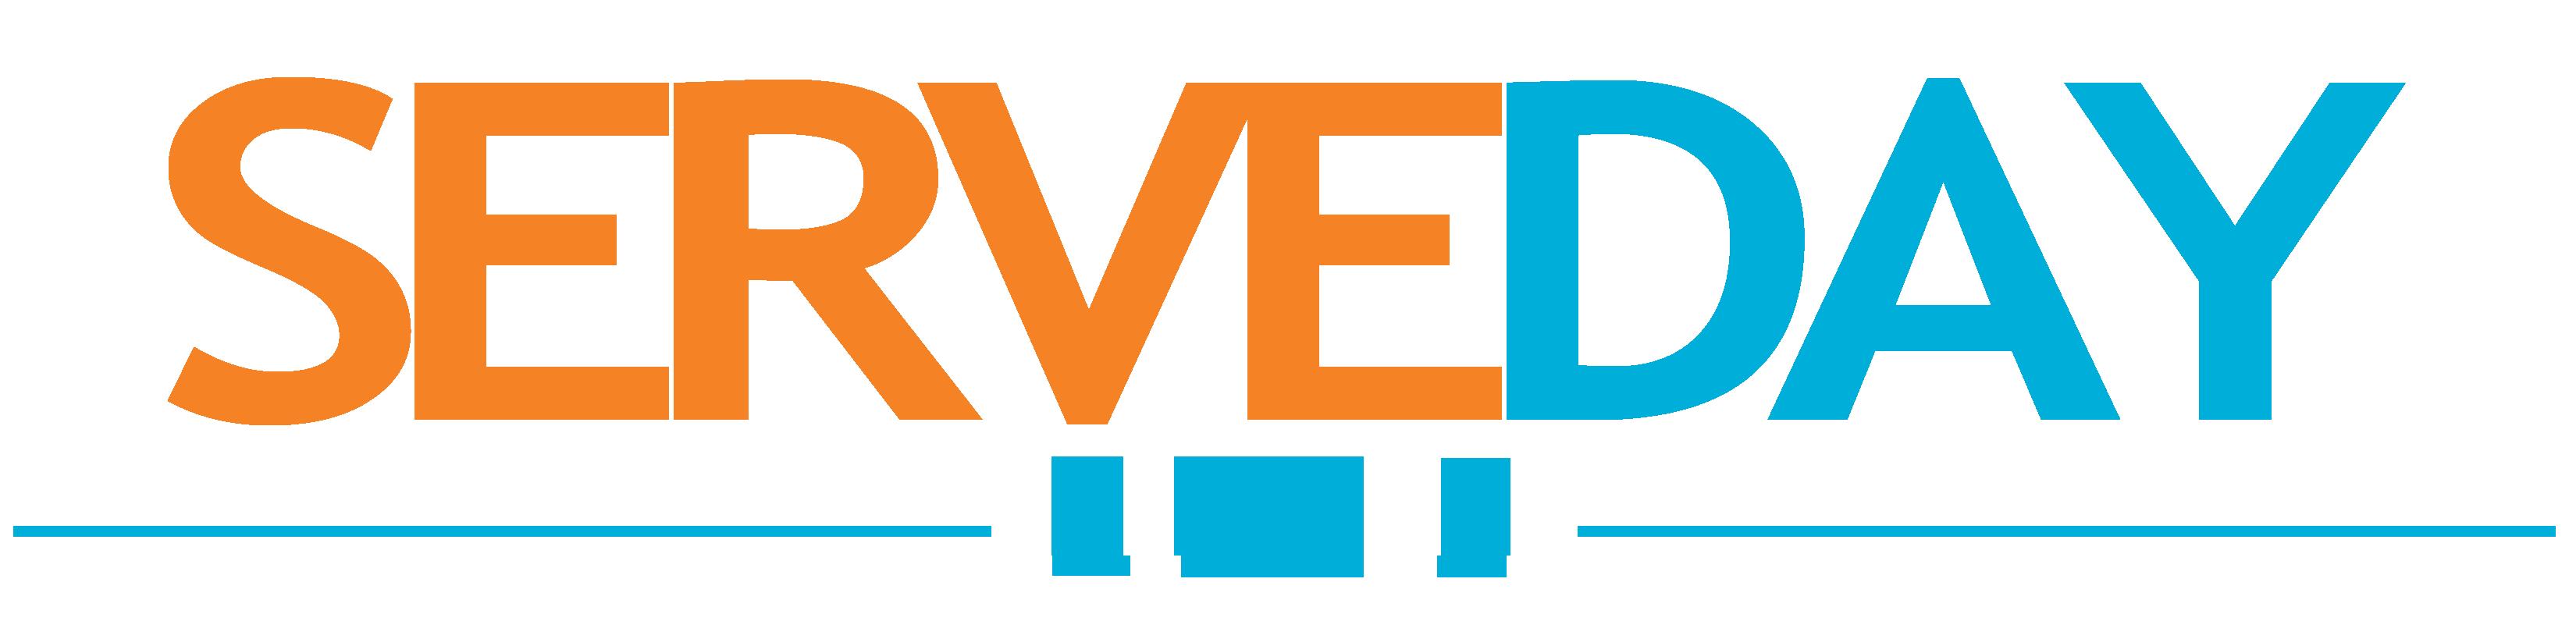 ServeDAY-2015